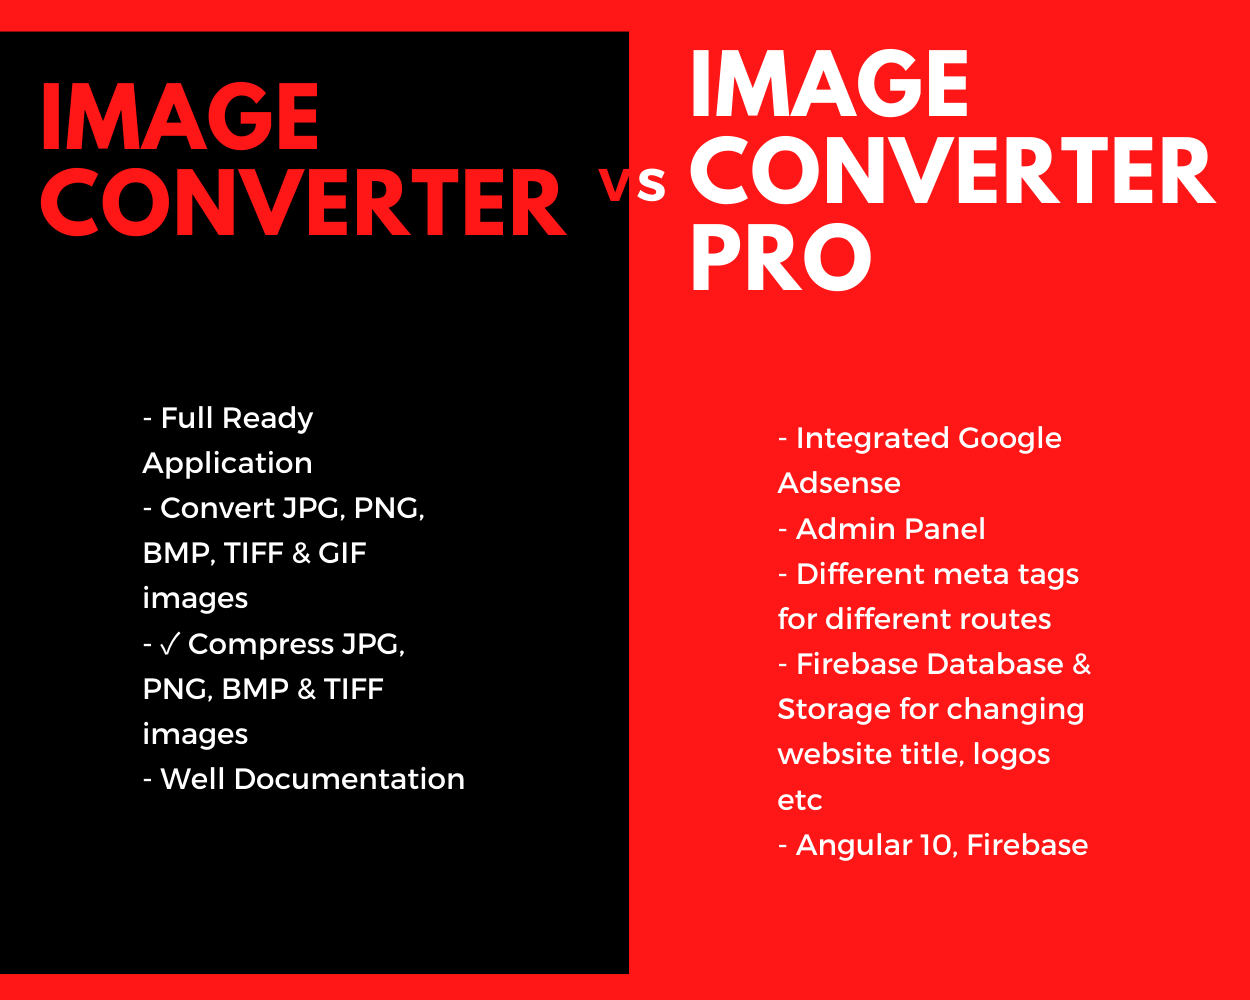 Image Converter Pro (Angular 10 & Firebase) Full Production Ready Application With Admin Panel - 1